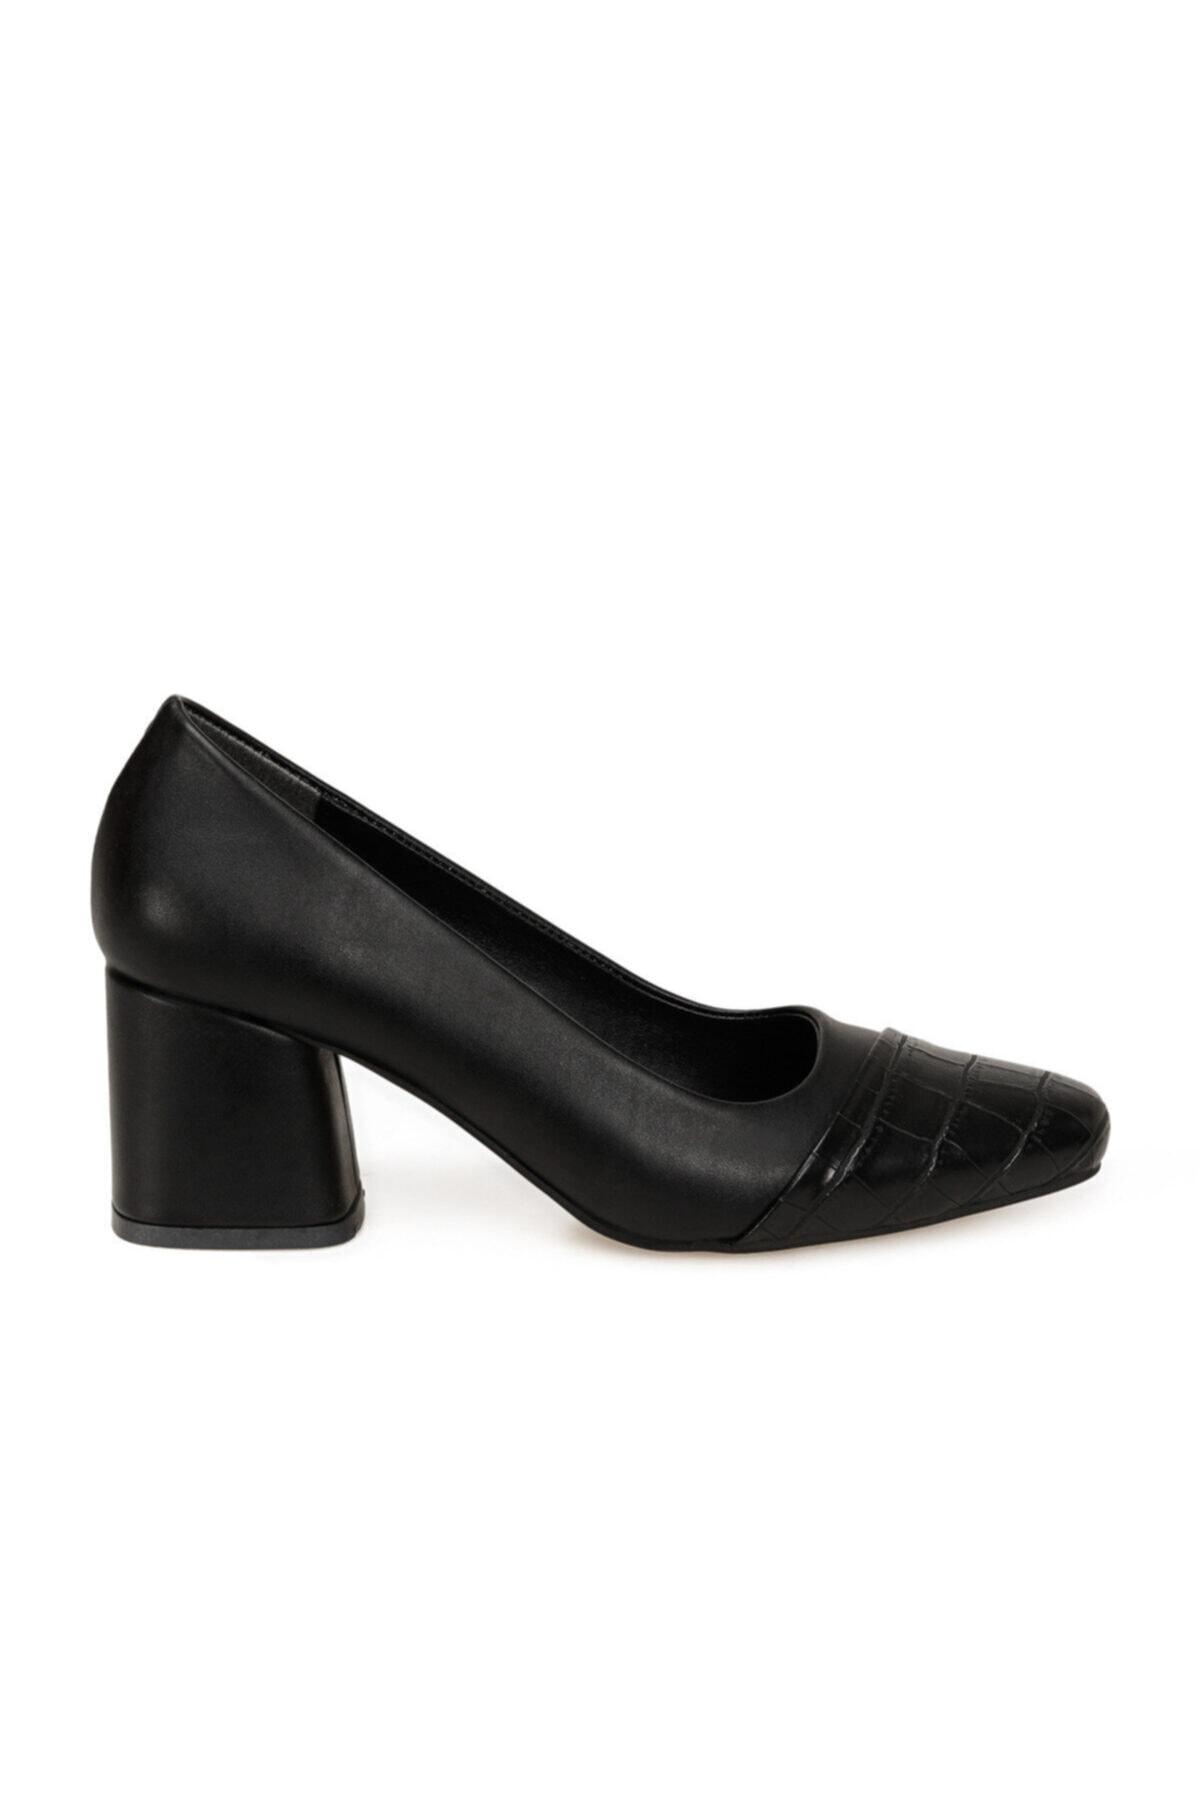 Butigo LİLY Siyah Kadın Topuklu Ayakkabı 100666957 2